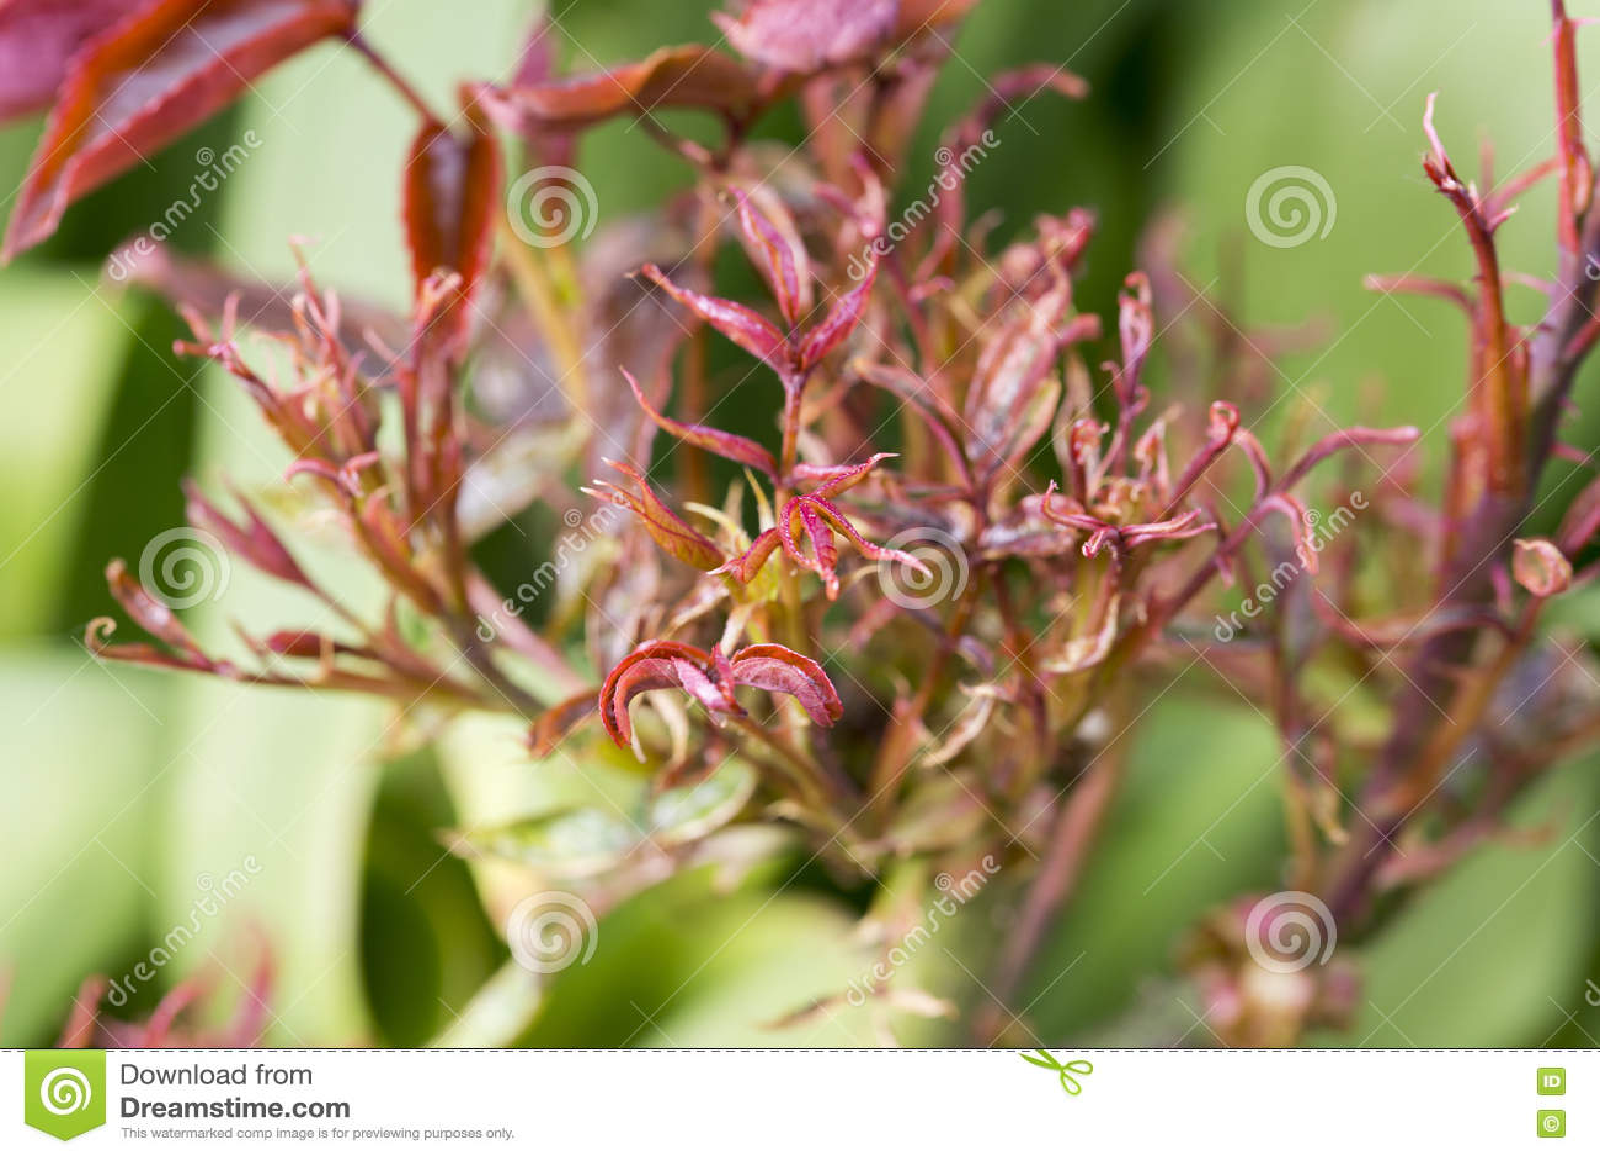 Parasite de la maladie de rosier image stock image 71227073 - Maladie des rosiers photo ...